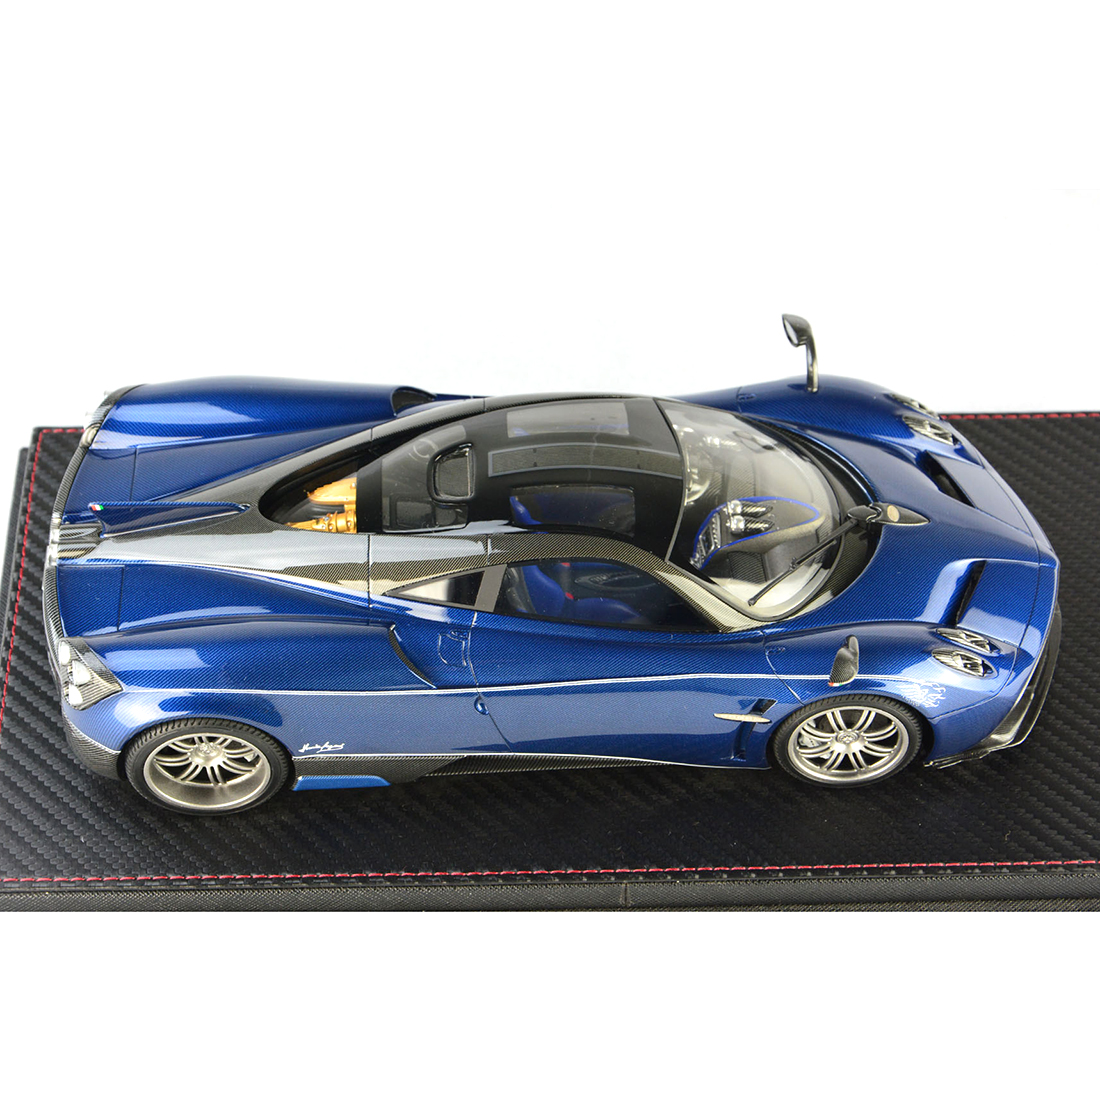 1:18 Auto Model Pagani Huayra Model Collection Decor Met Base Stofkap Model Educatief Speelgoed Blauw/Charcoal Grey /Paars Rood - 6